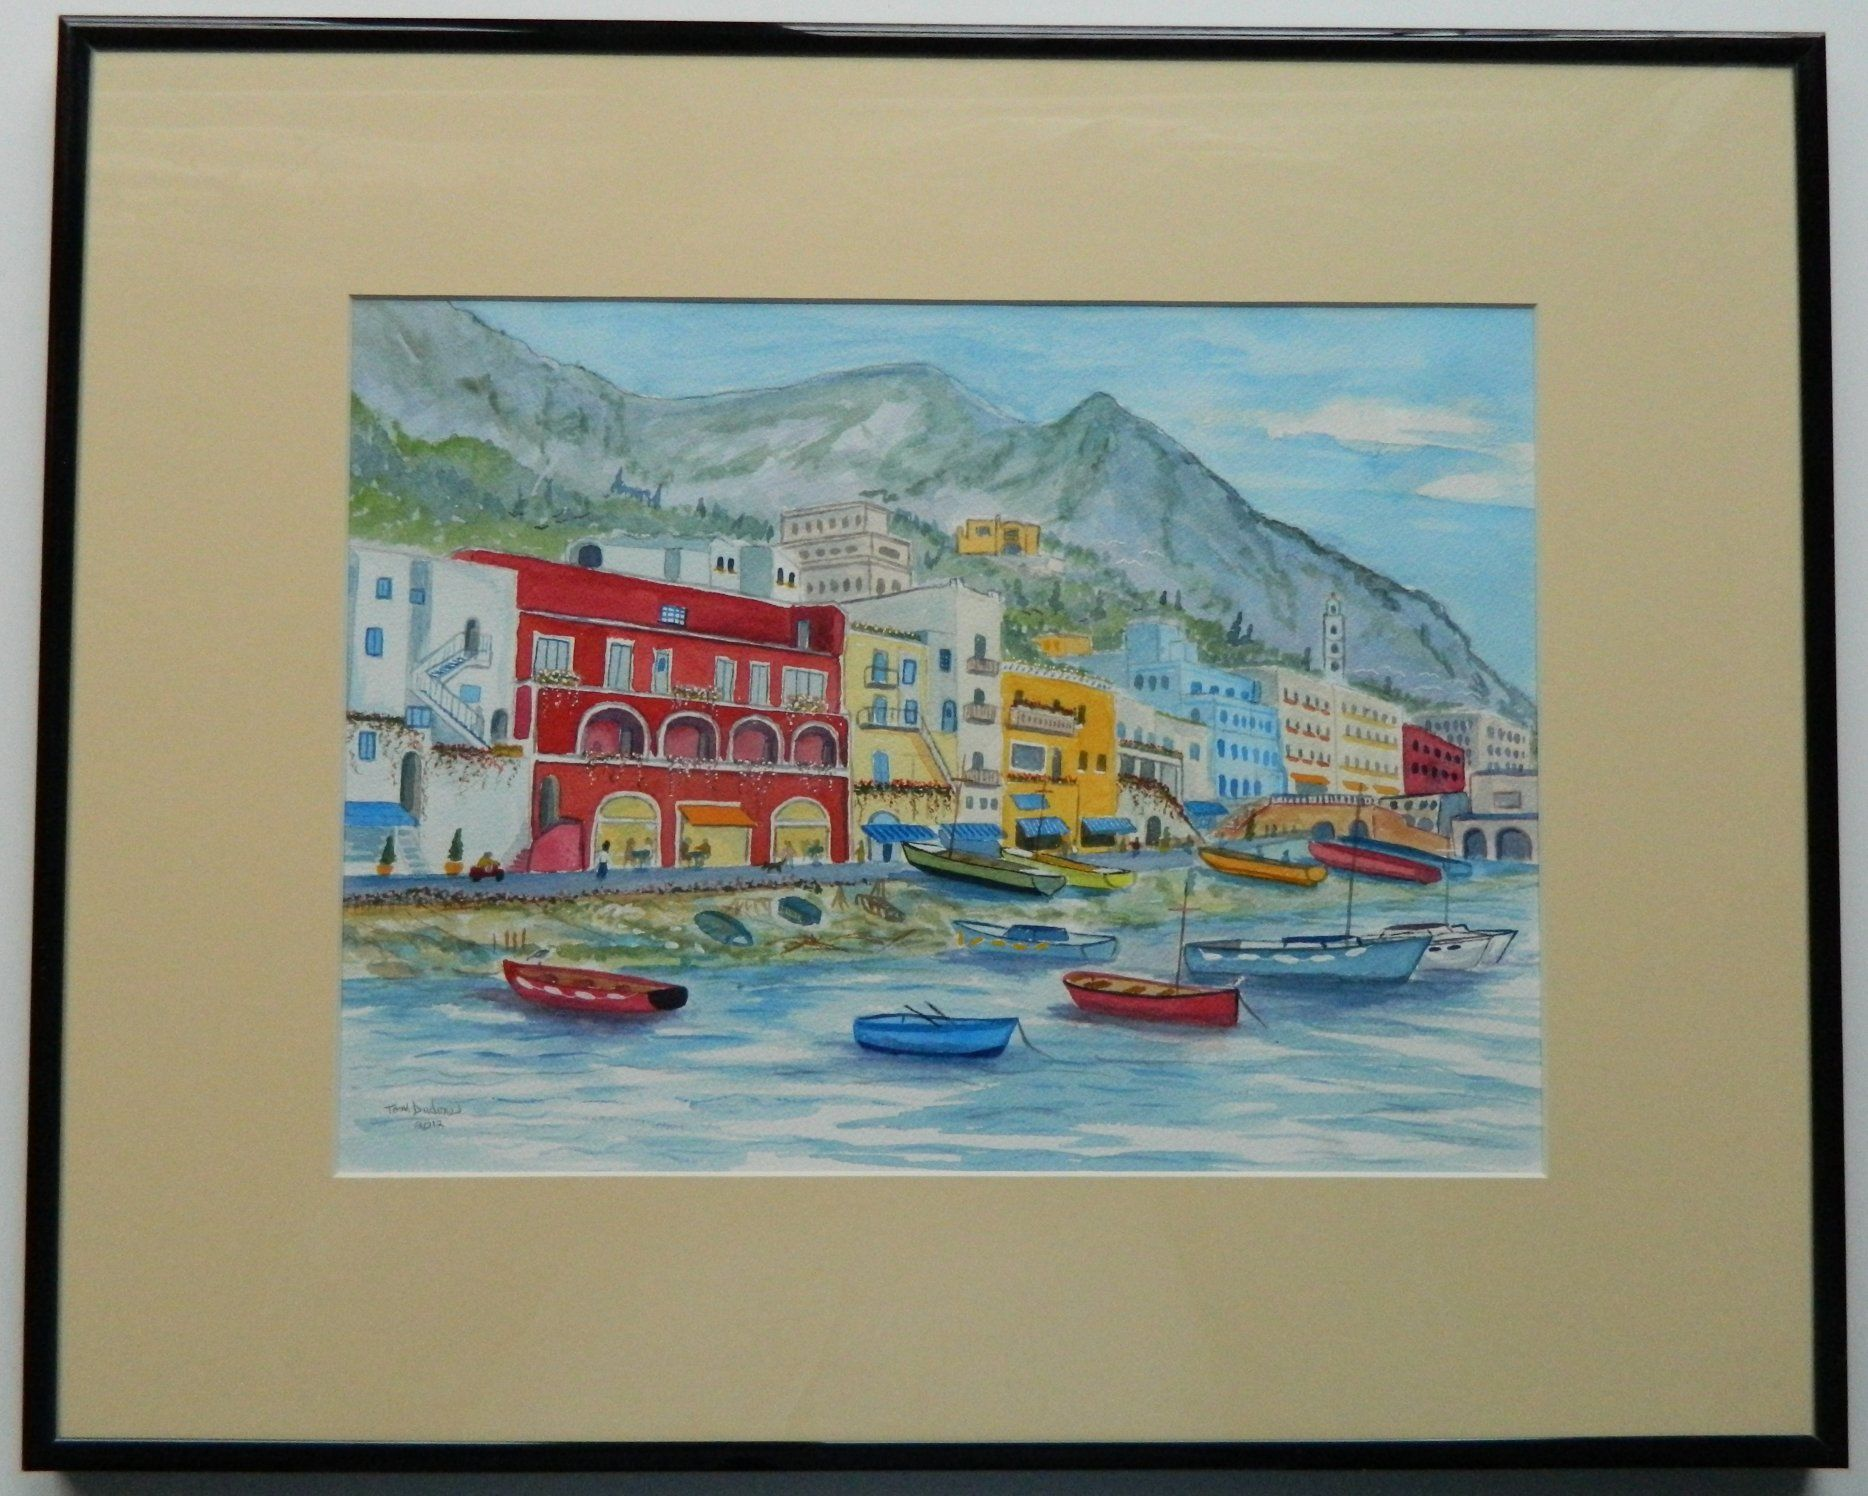 Die Inseln im Golf von Neapel: Procida, Capri, Ischia ... |Capri Italy Golf